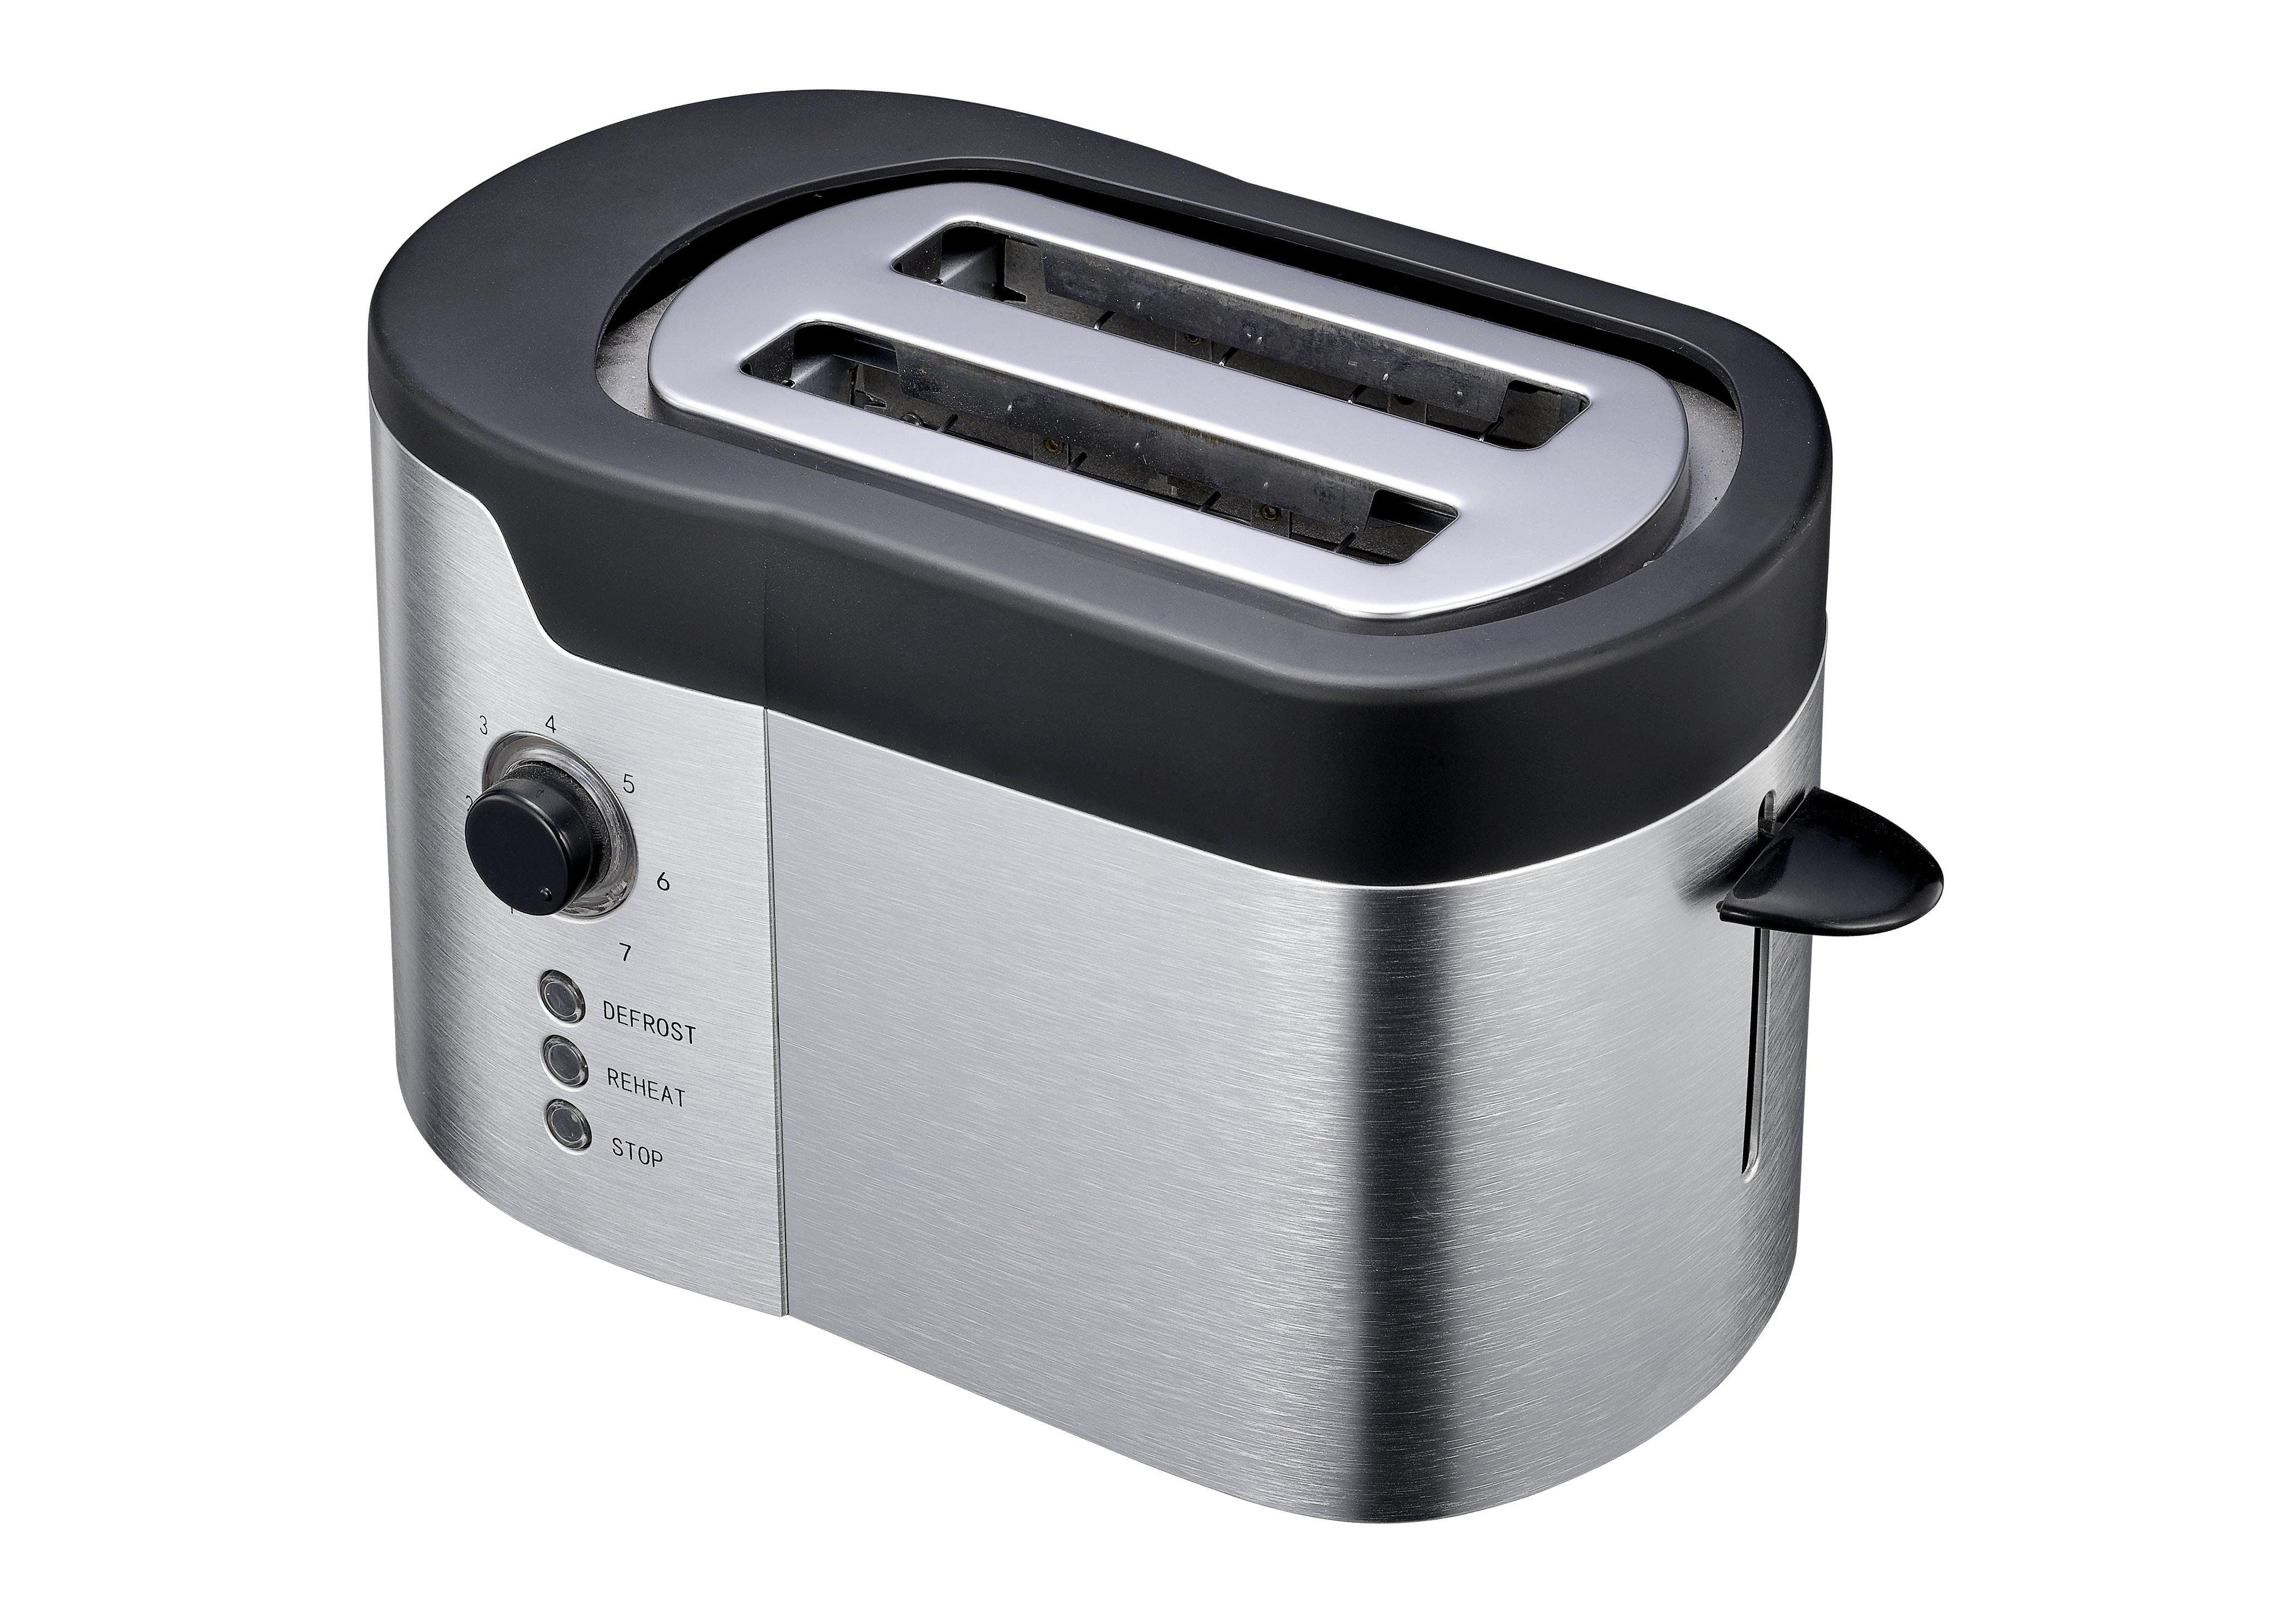 bagel asp productdetail decker sh silver toast black toaster